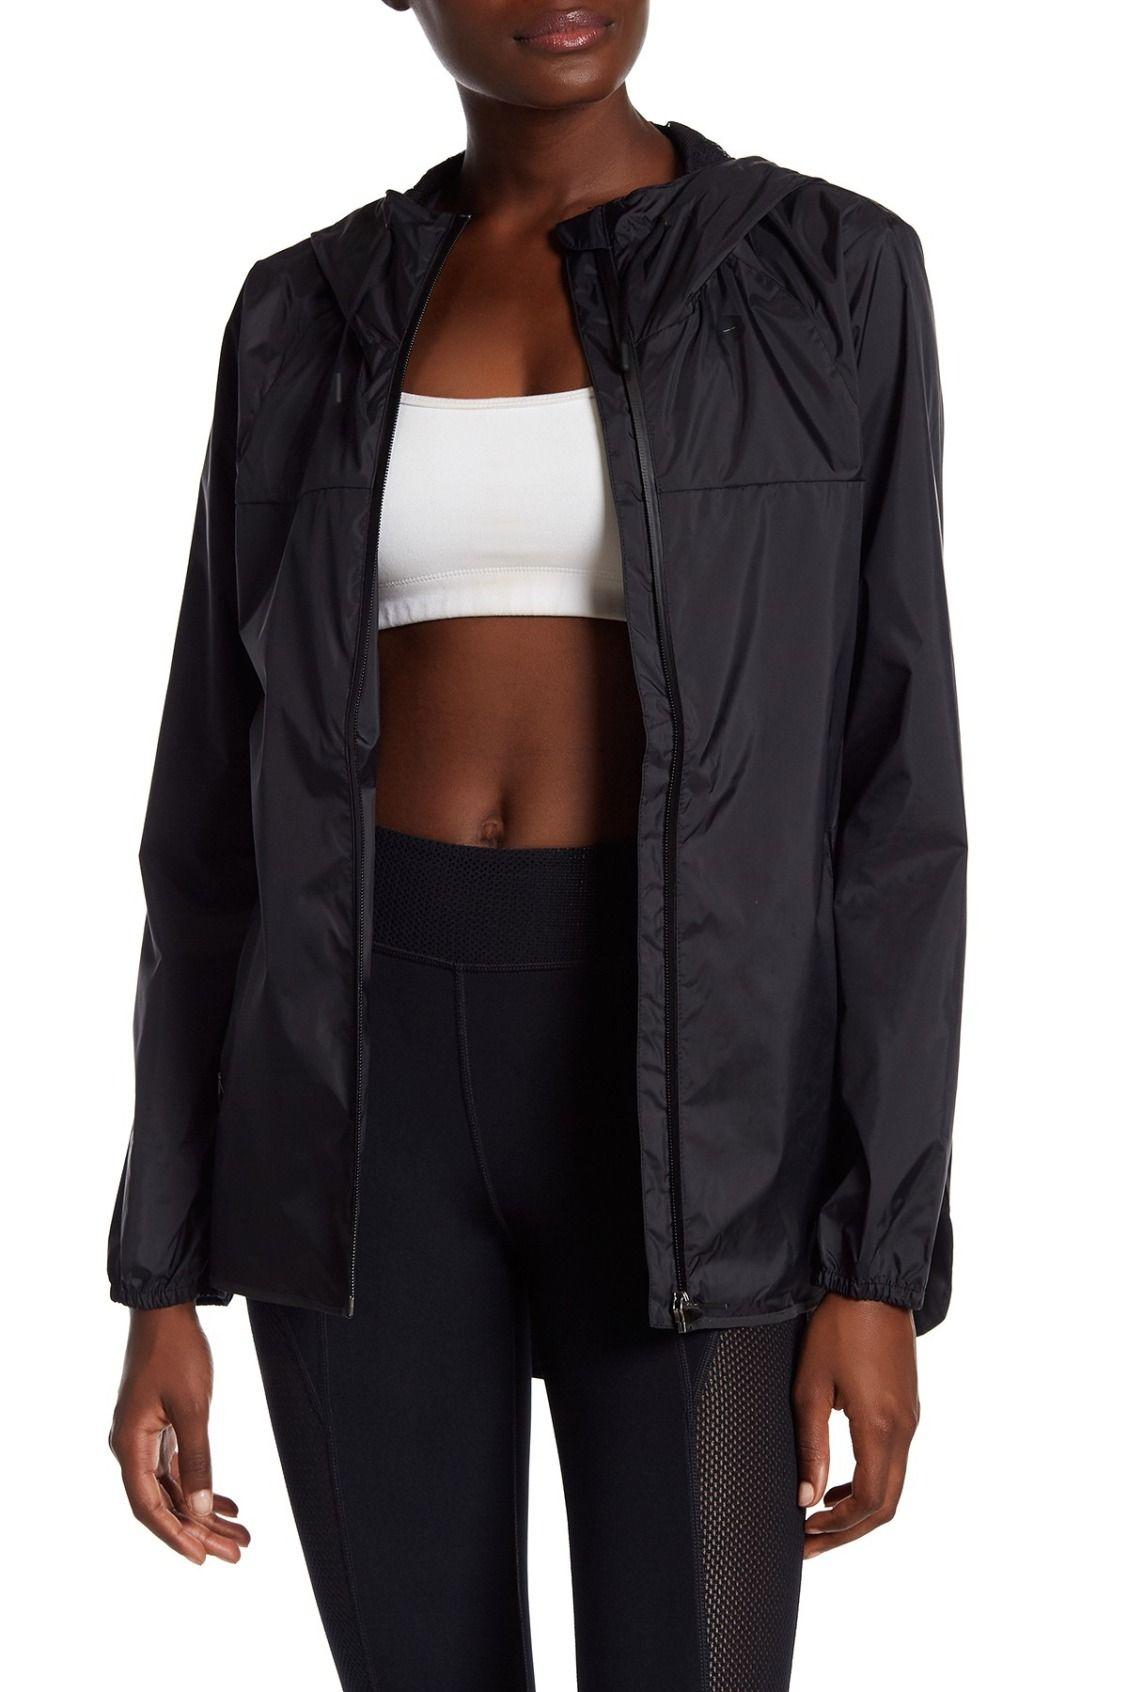 Ivy Park Hooded Long Sleeve Jacket Long sleeves jacket